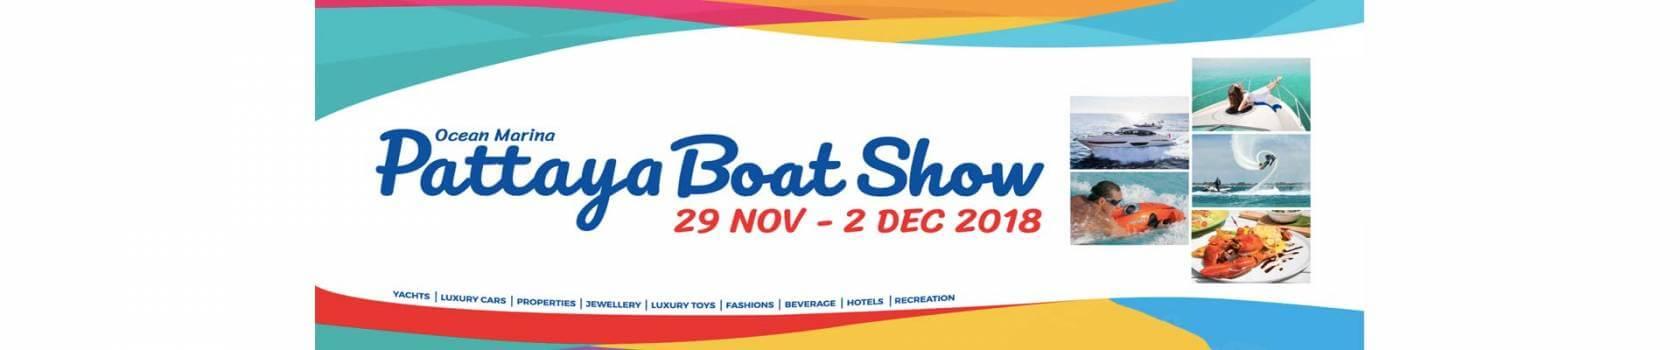 Ocean Marina Pattaya Boat Show 2018